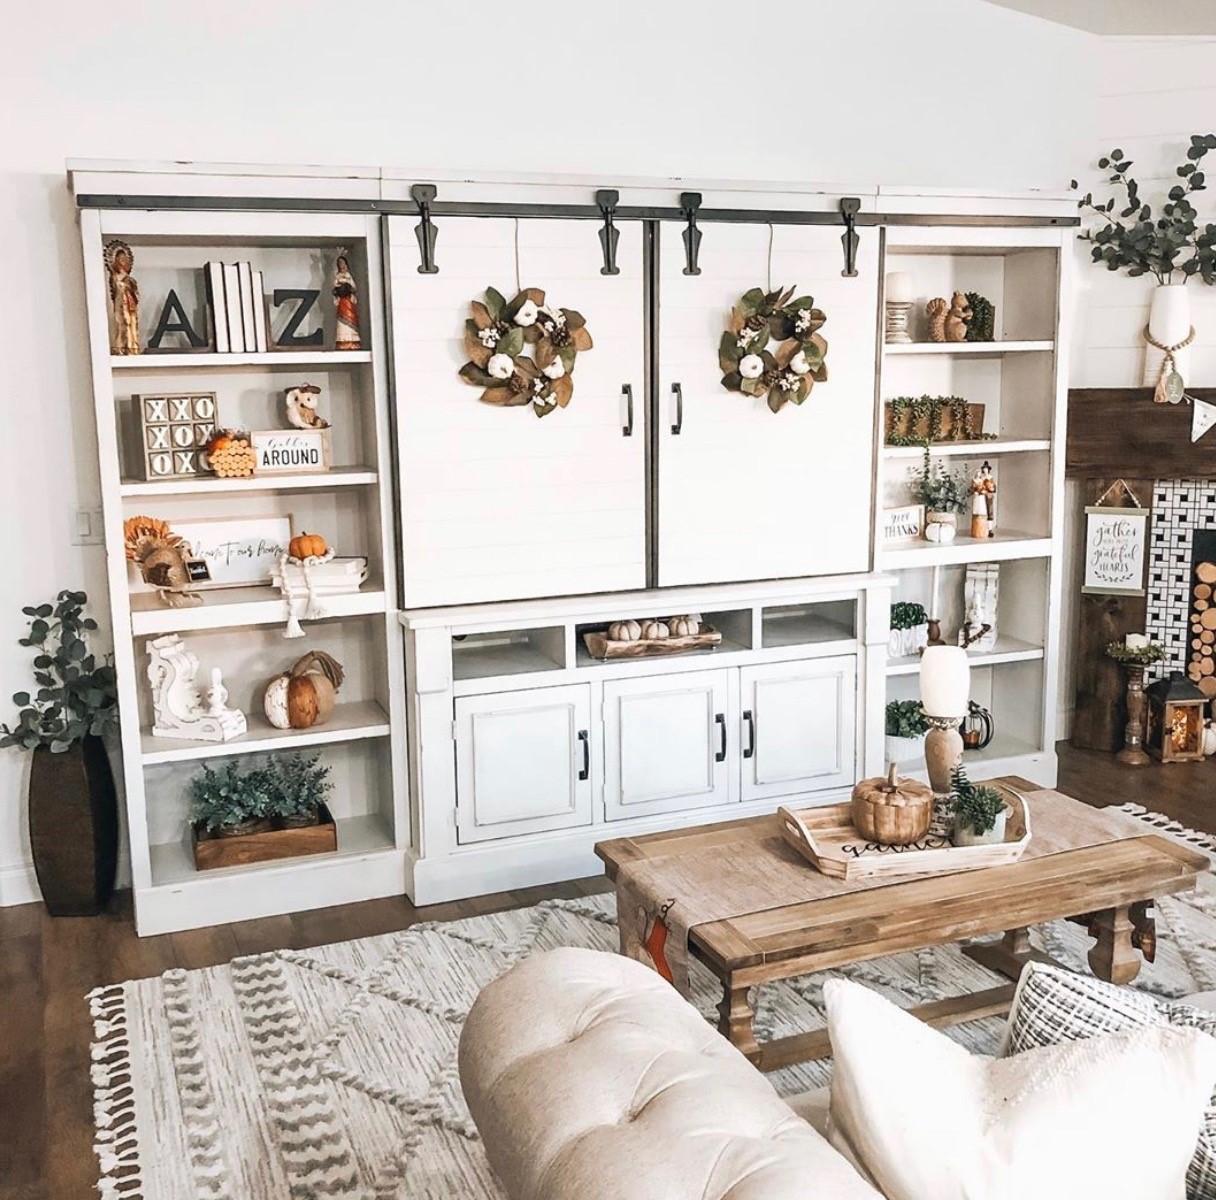 Ashley Furniture HomeStore 4440 Cerrillos Rd, Santa Fe